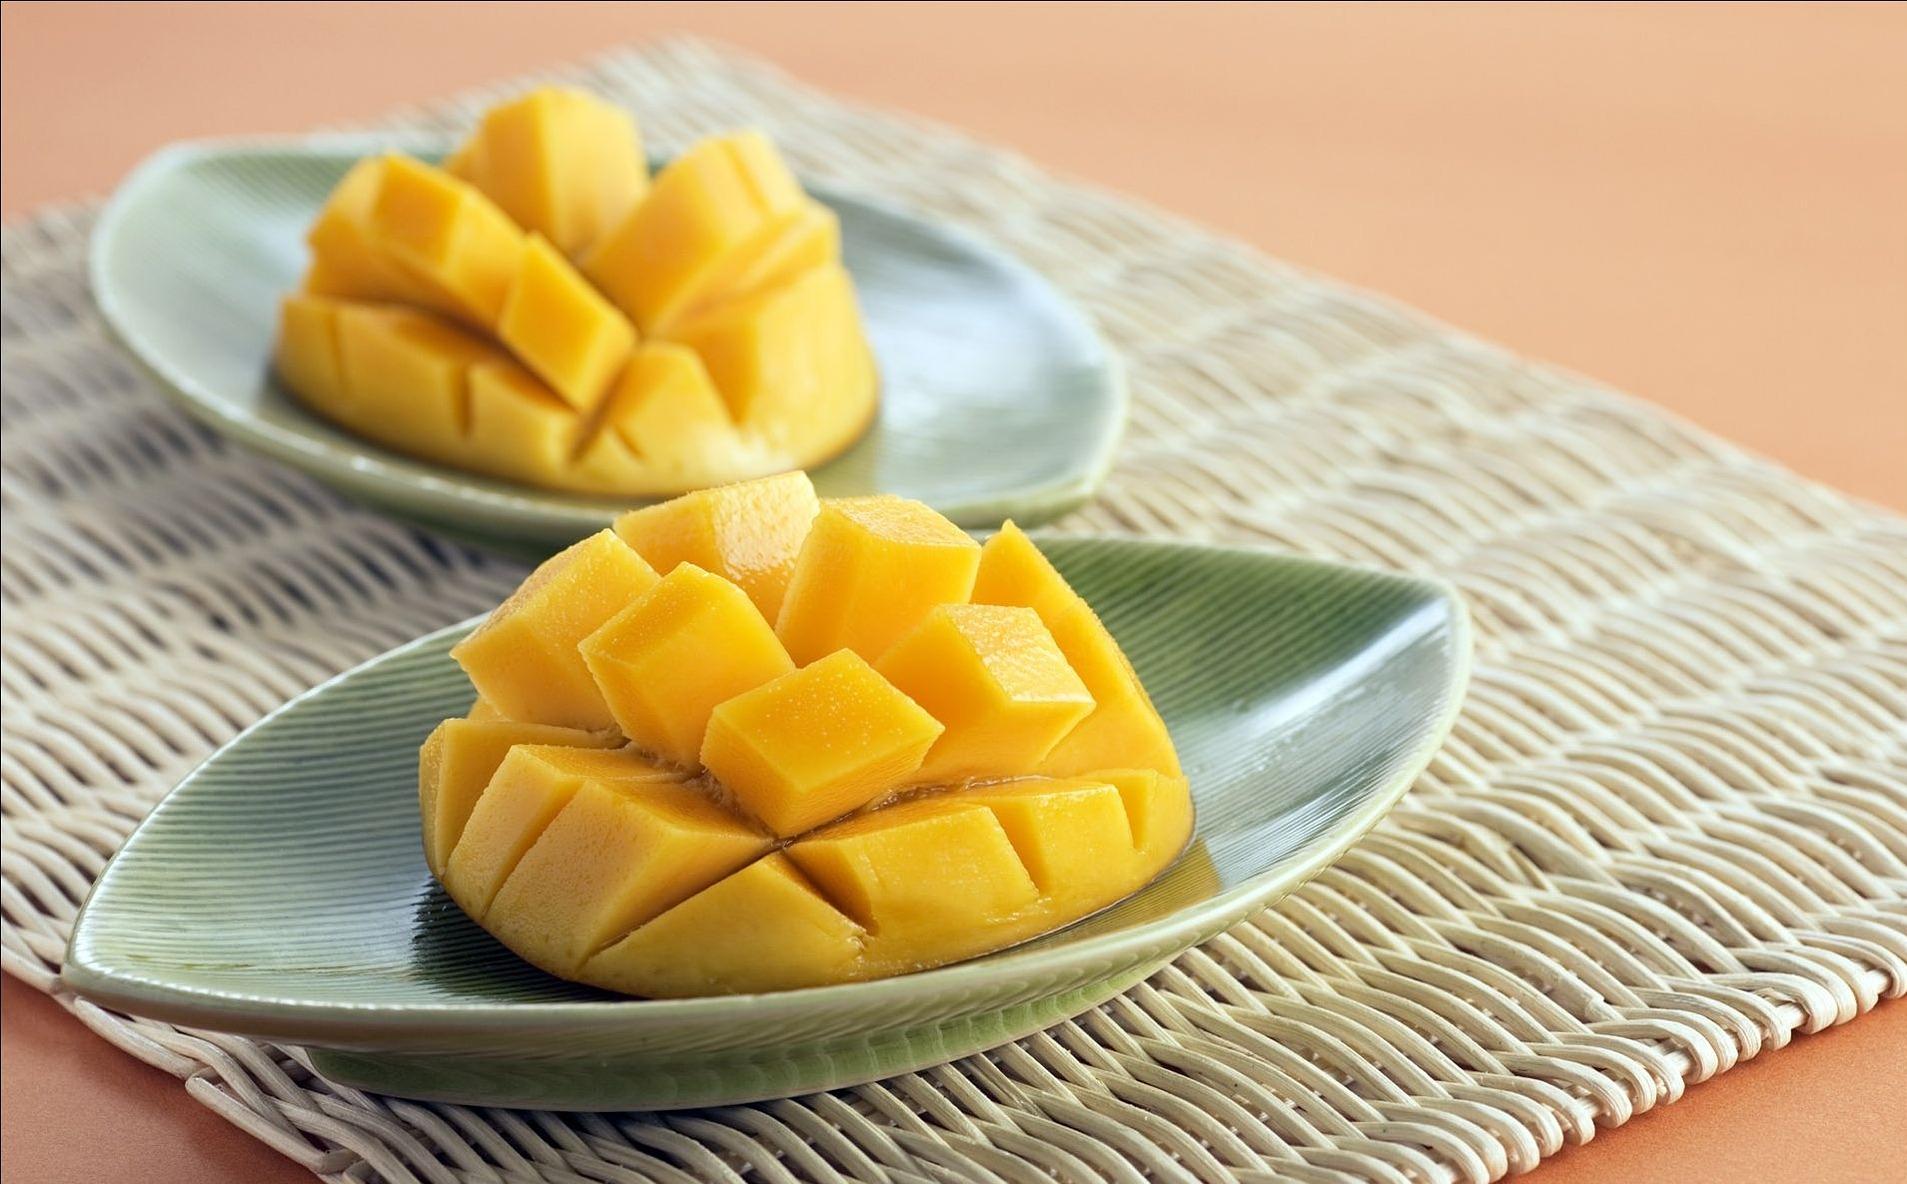 mango-2360551_1920.jpg